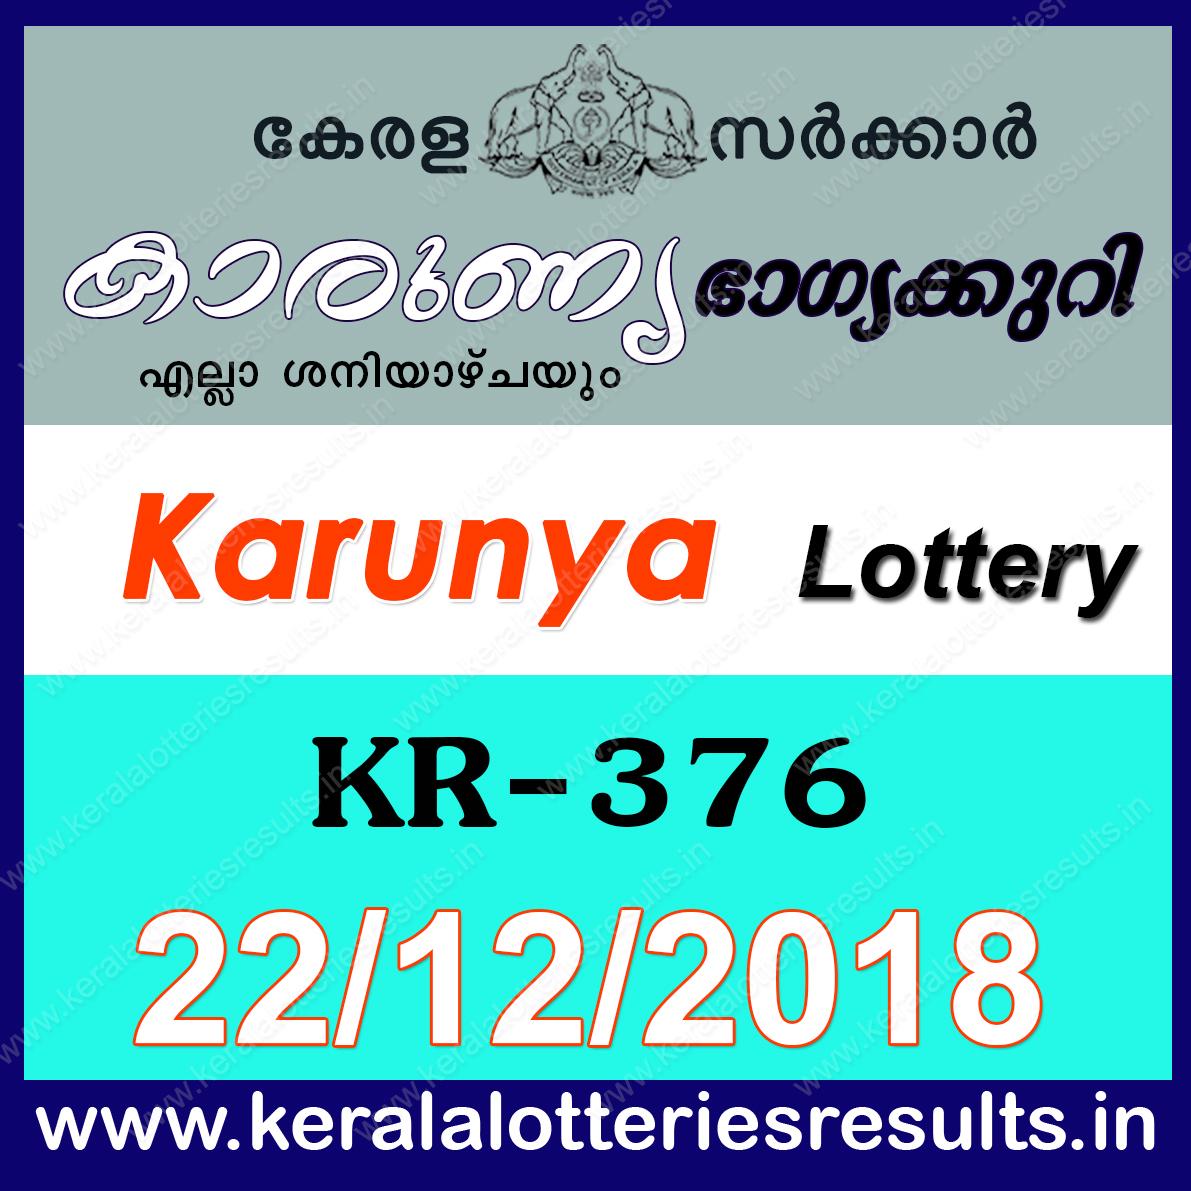 Kerala Lottery Result; 22.12.2018 Karunya Lottery Results